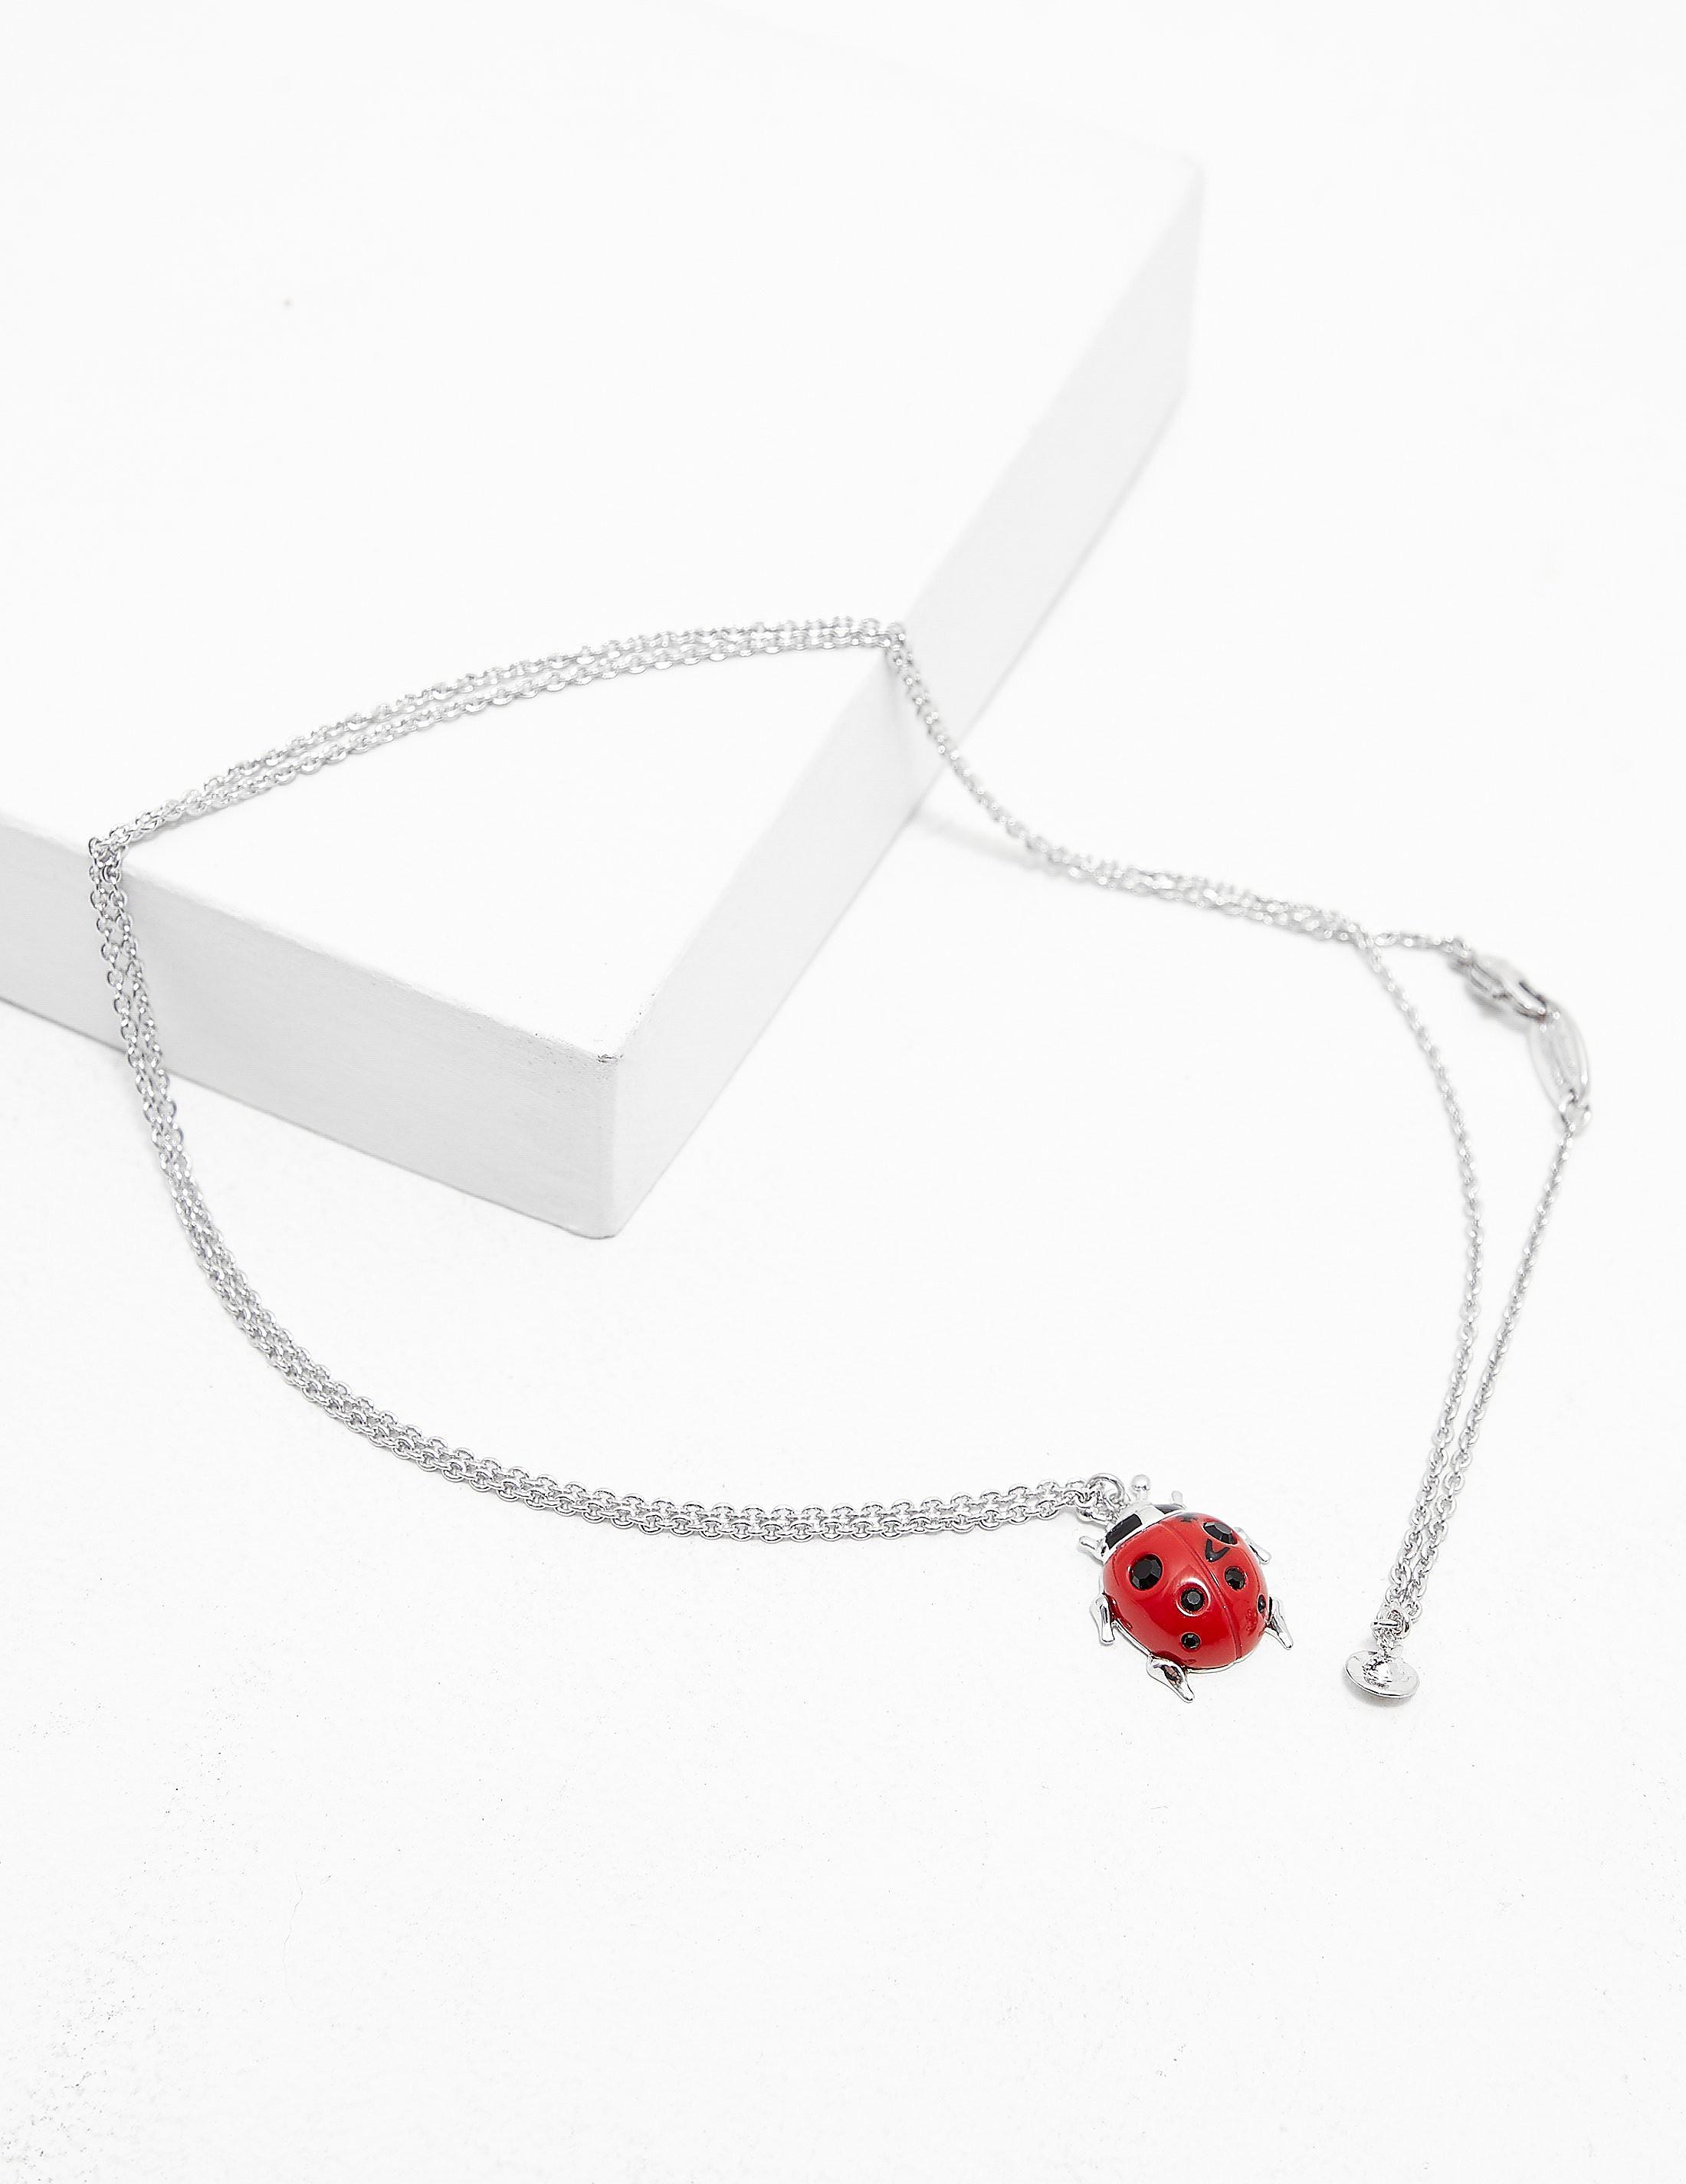 Vivienne Westwood Ladybird Necklace